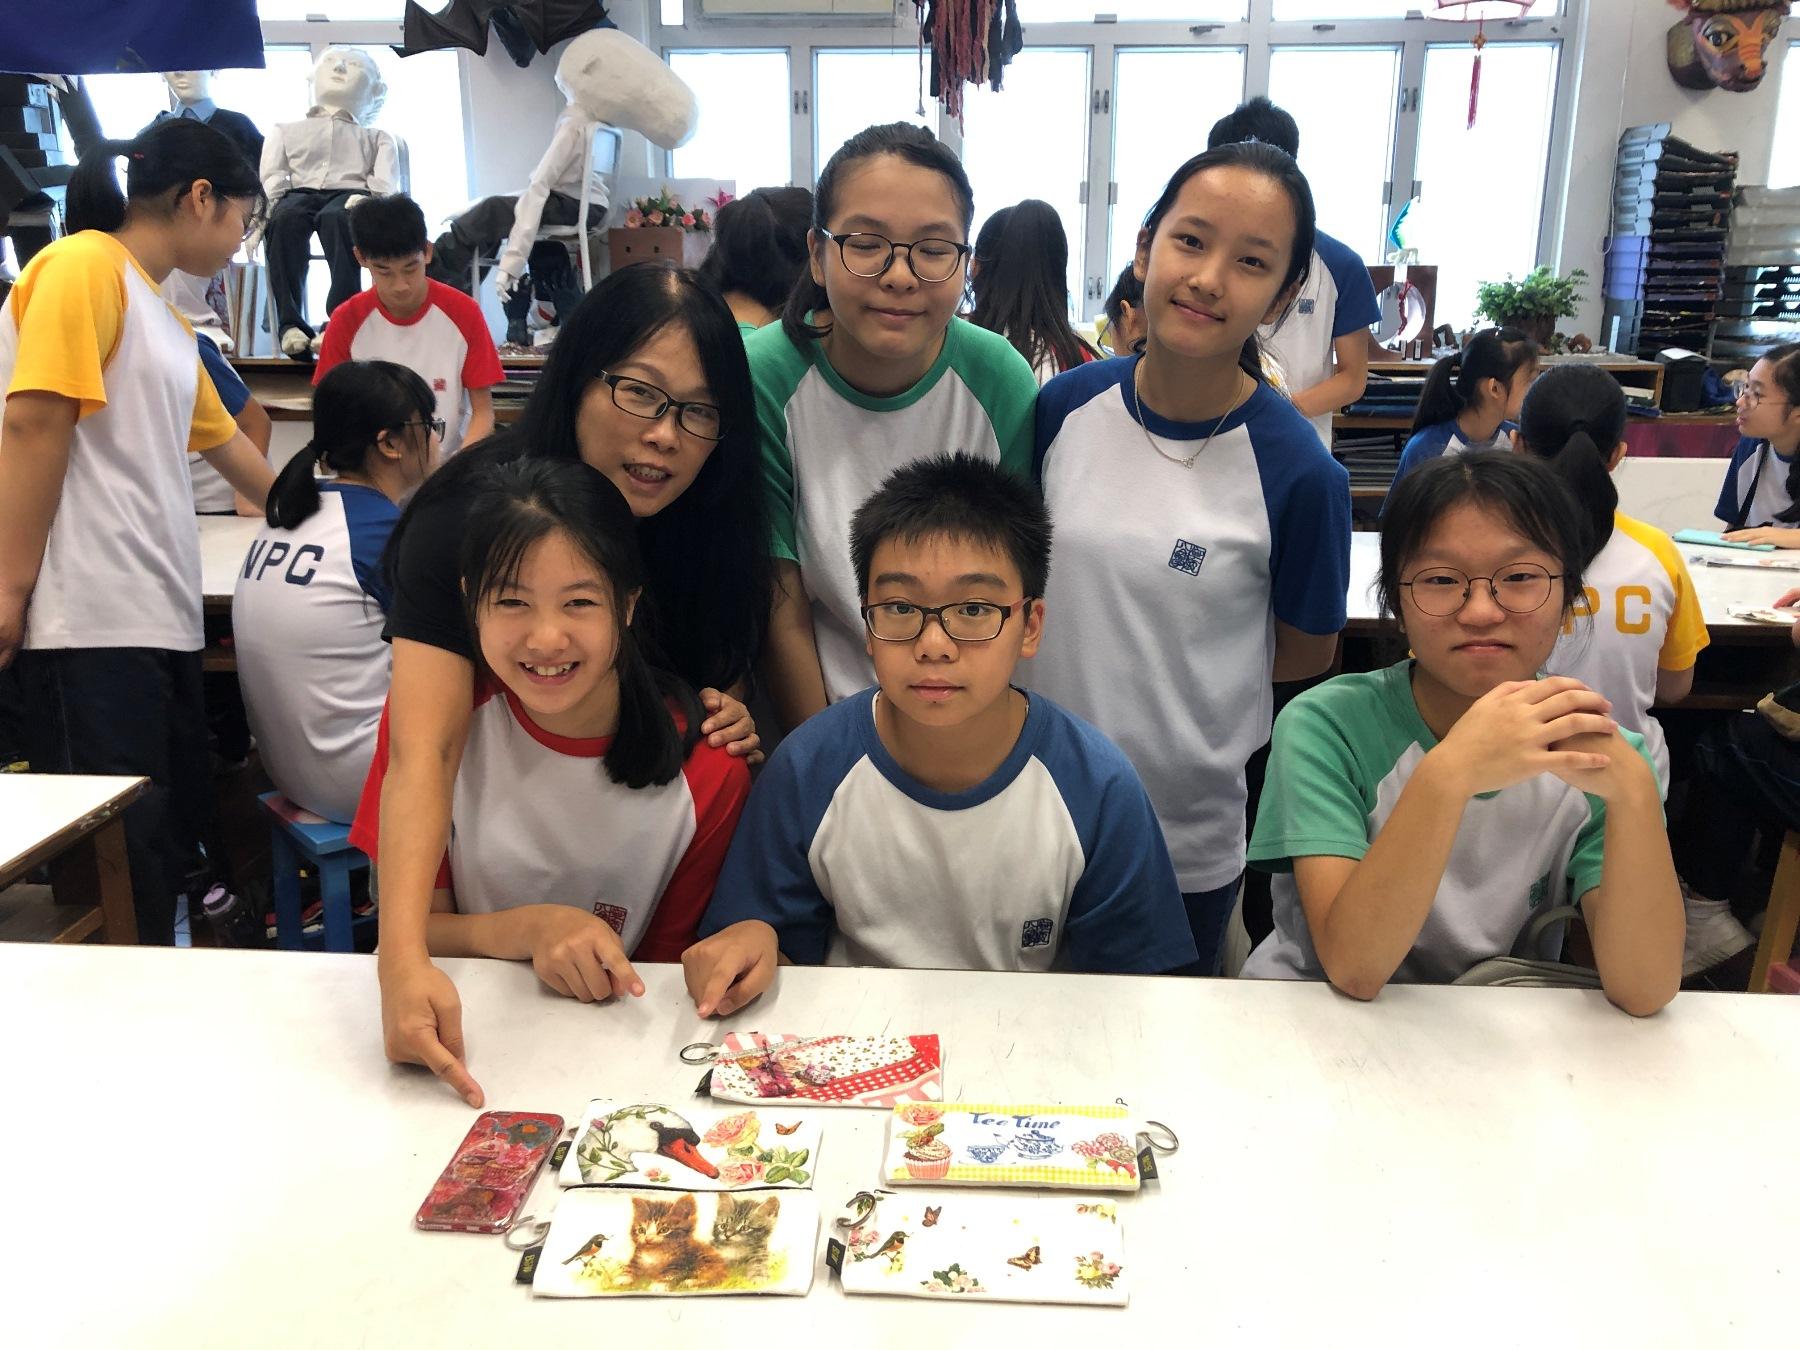 http://npc.edu.hk/sites/default/files/img_7008_2.jpg